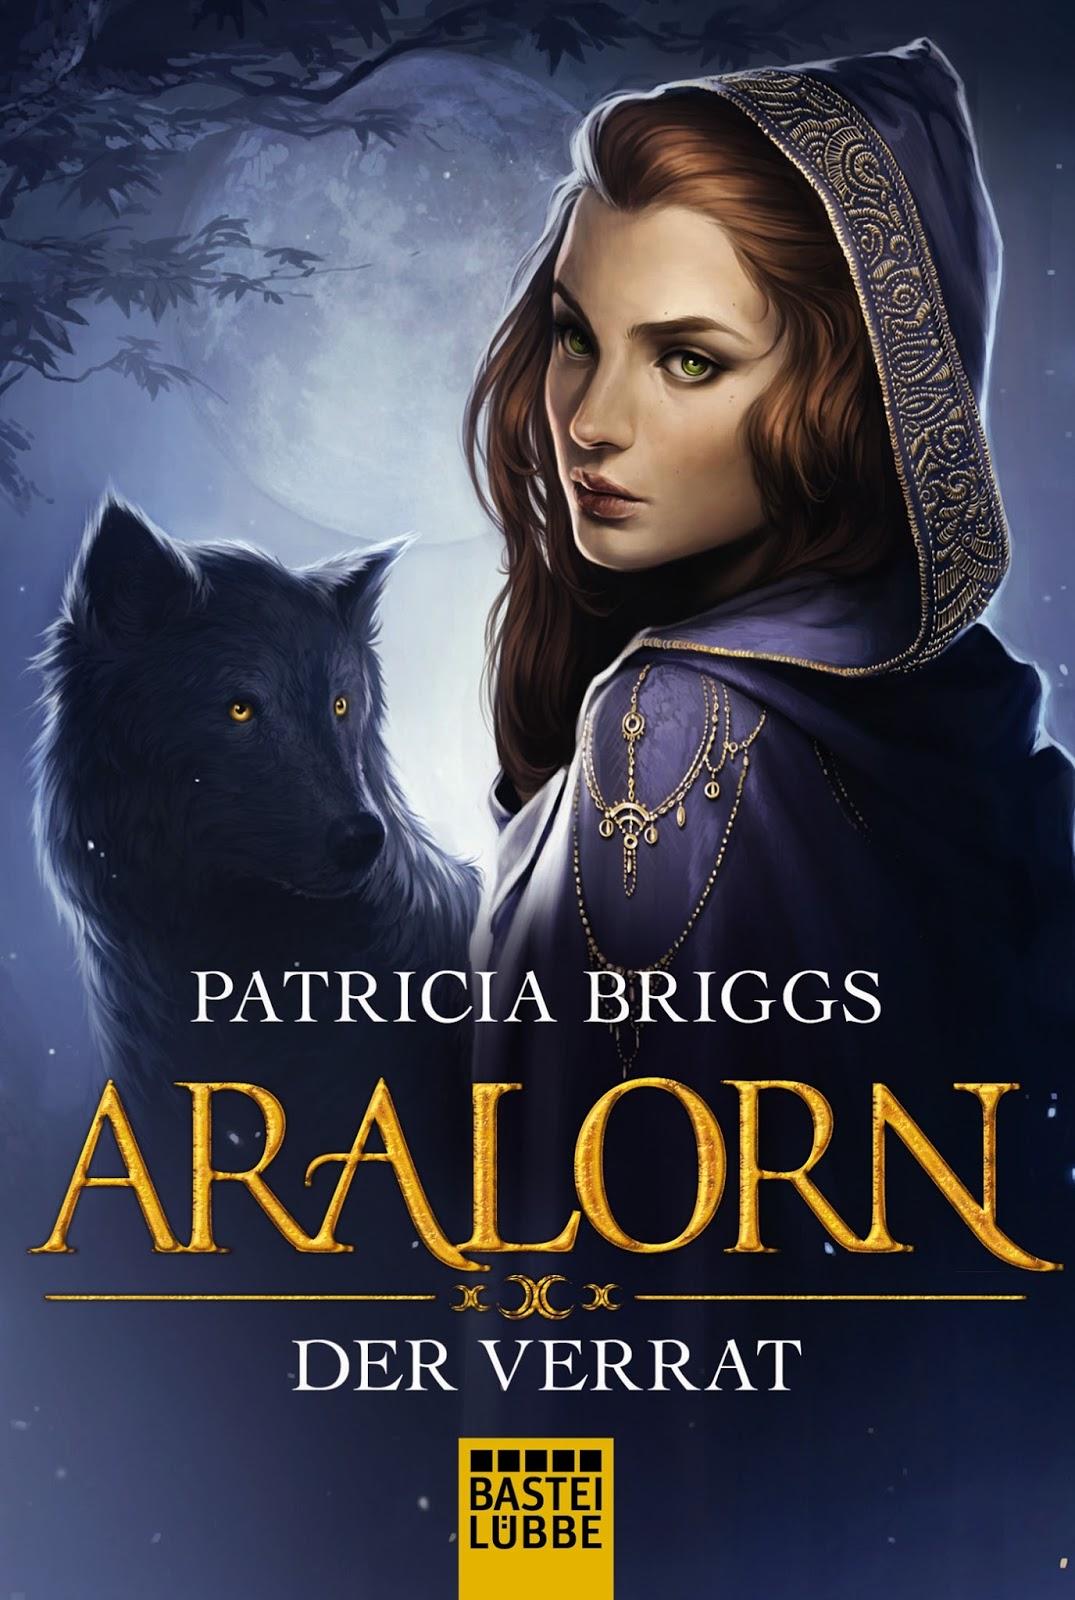 Aralorn - Der Verrat von Patricia Briggs